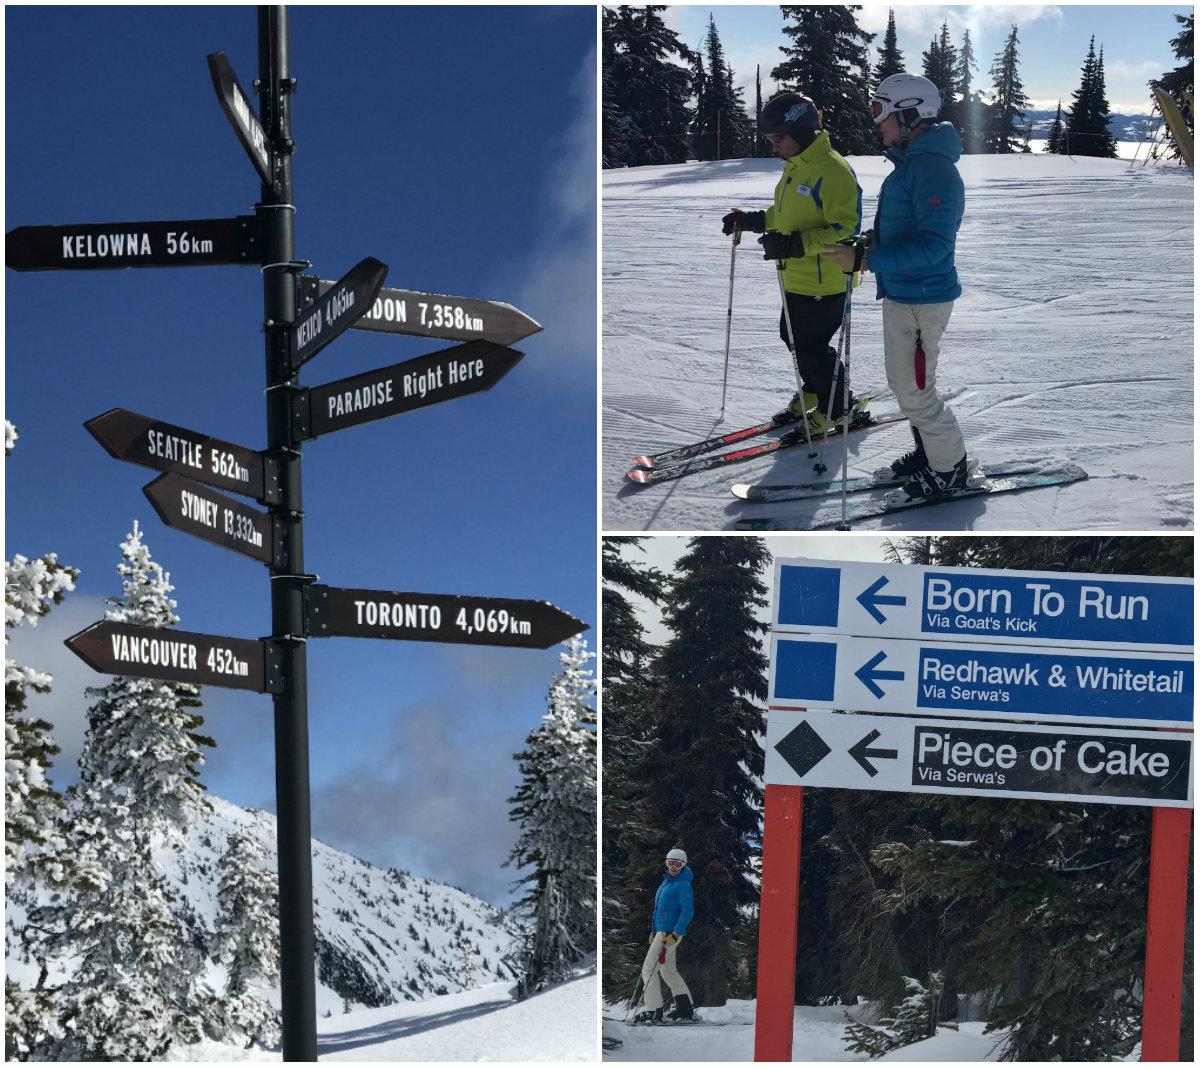 Else van WintersportCanadaAmerika test de pistes van Big White uit.